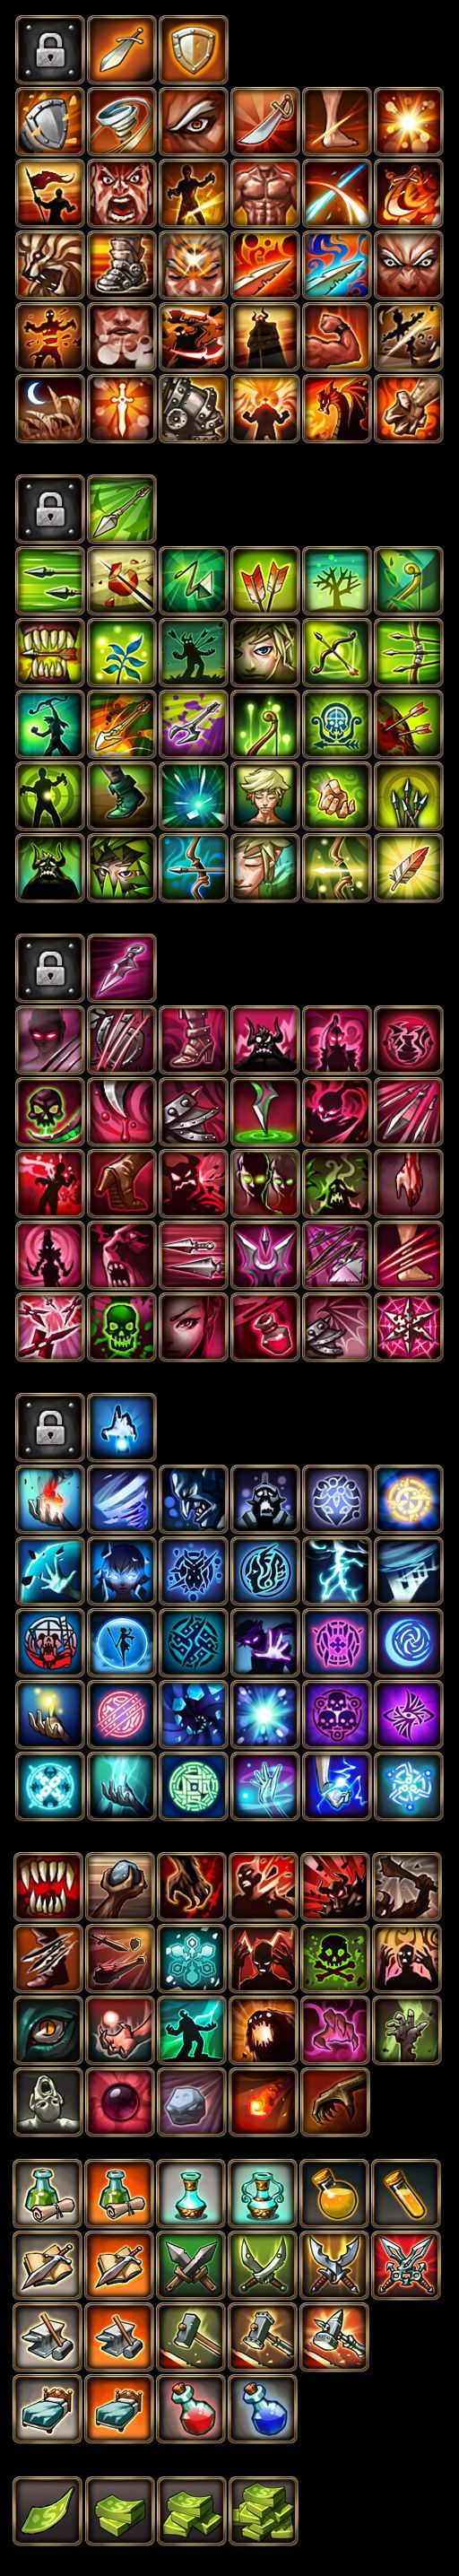 Skill icons: